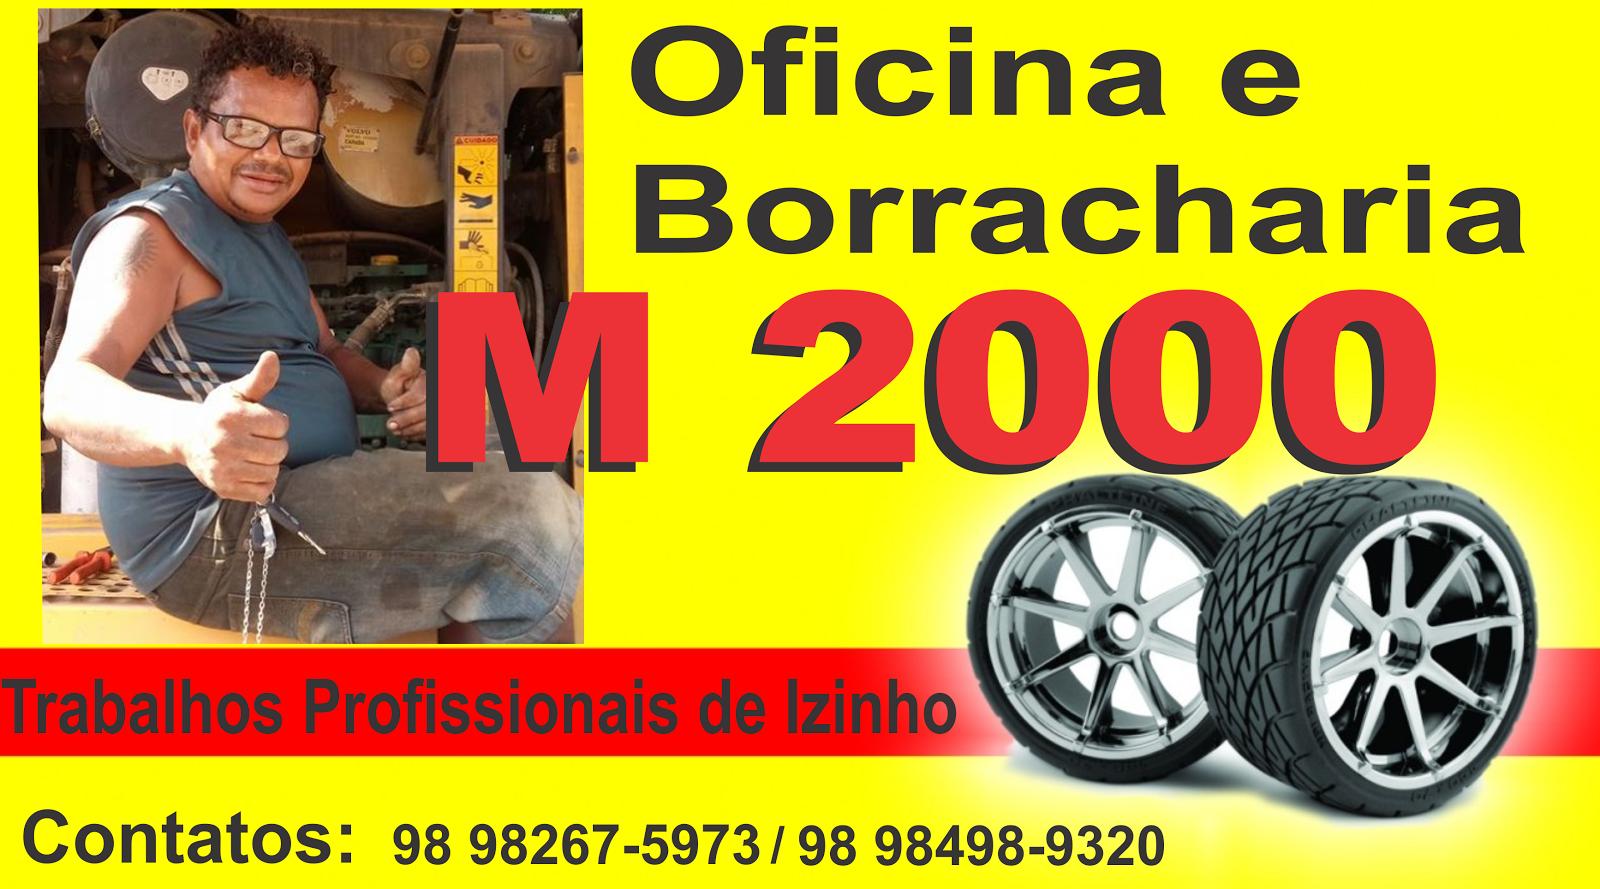 OFICINA E BORRACHARIA DO IZINHO